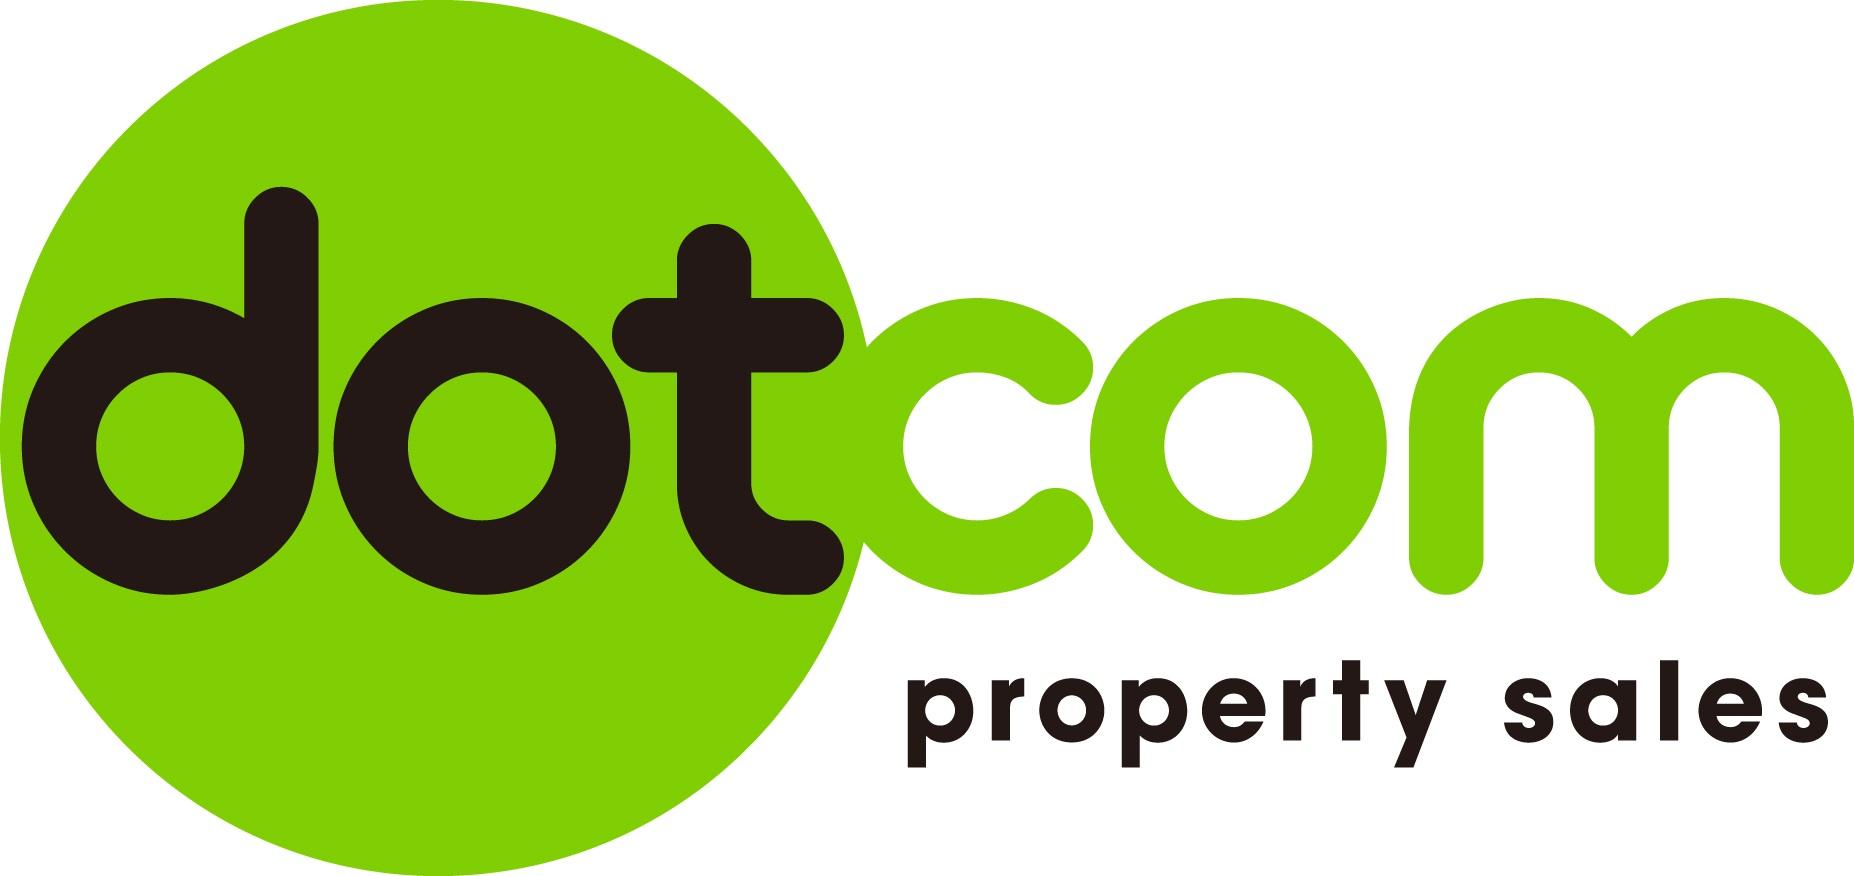 Dotcom Property Sales - North Balgowlah, North Balgowlah, 2093